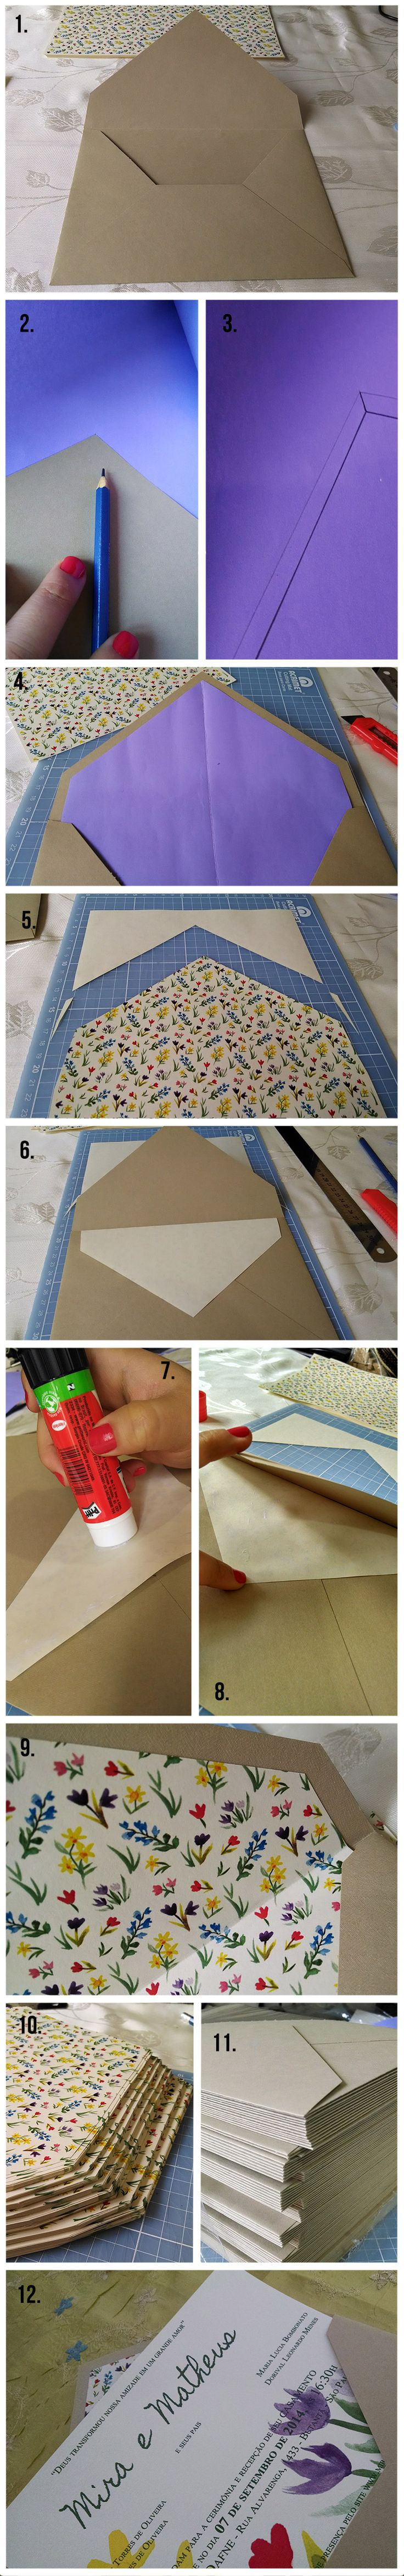 Passo a Passo: Convite com Forro - Como forrar envelopes para convites